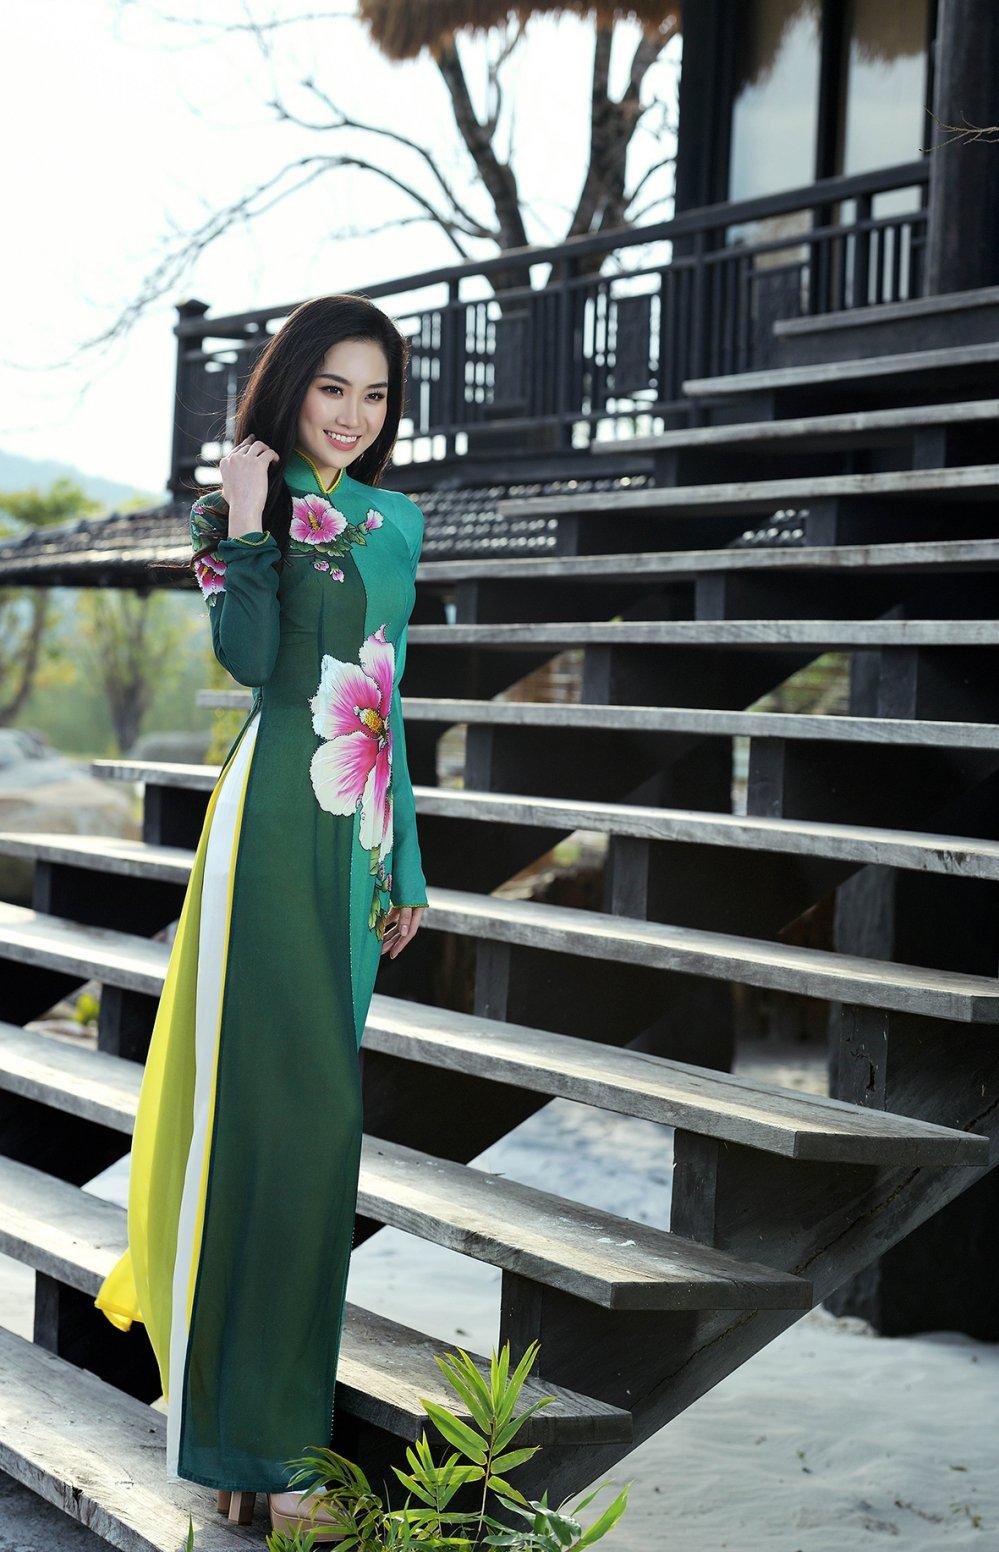 Le Hang dien ao dai khoe dang, tu tin do sac cung Lan Huong hinh anh 5